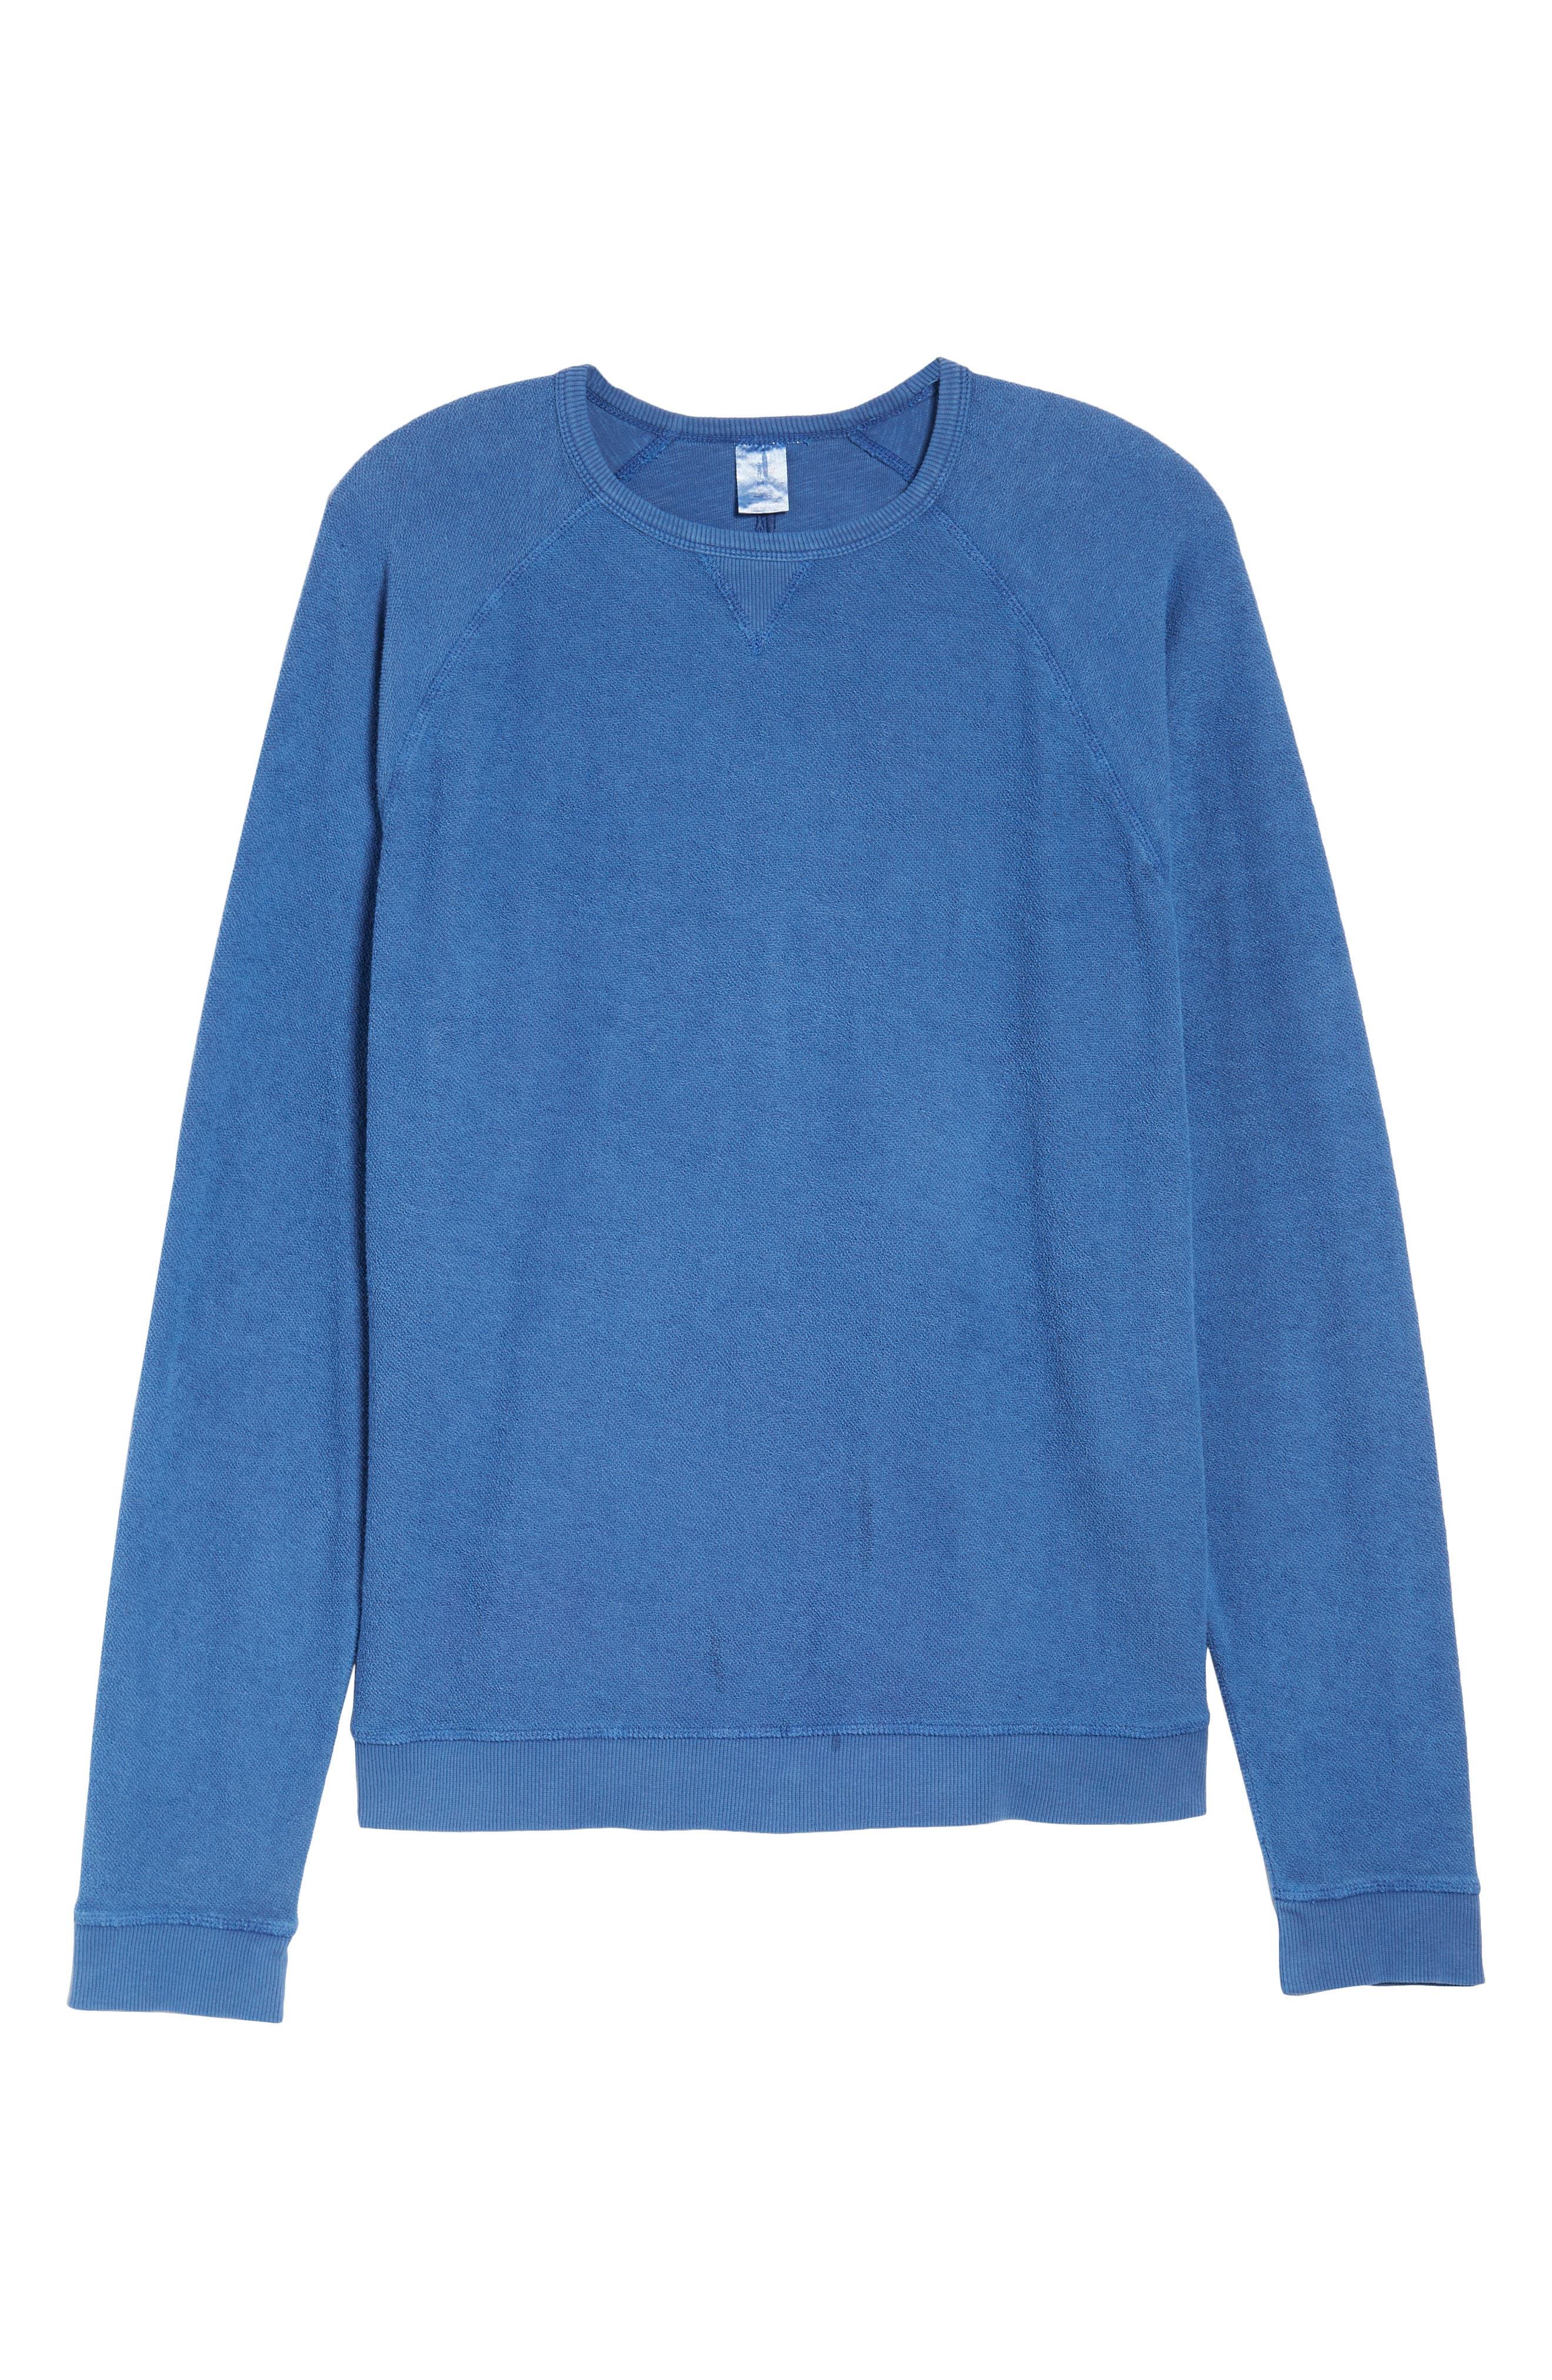 Mason Regular Fit Sweatshirt,                             Alternate thumbnail 6, color,                             TIDE